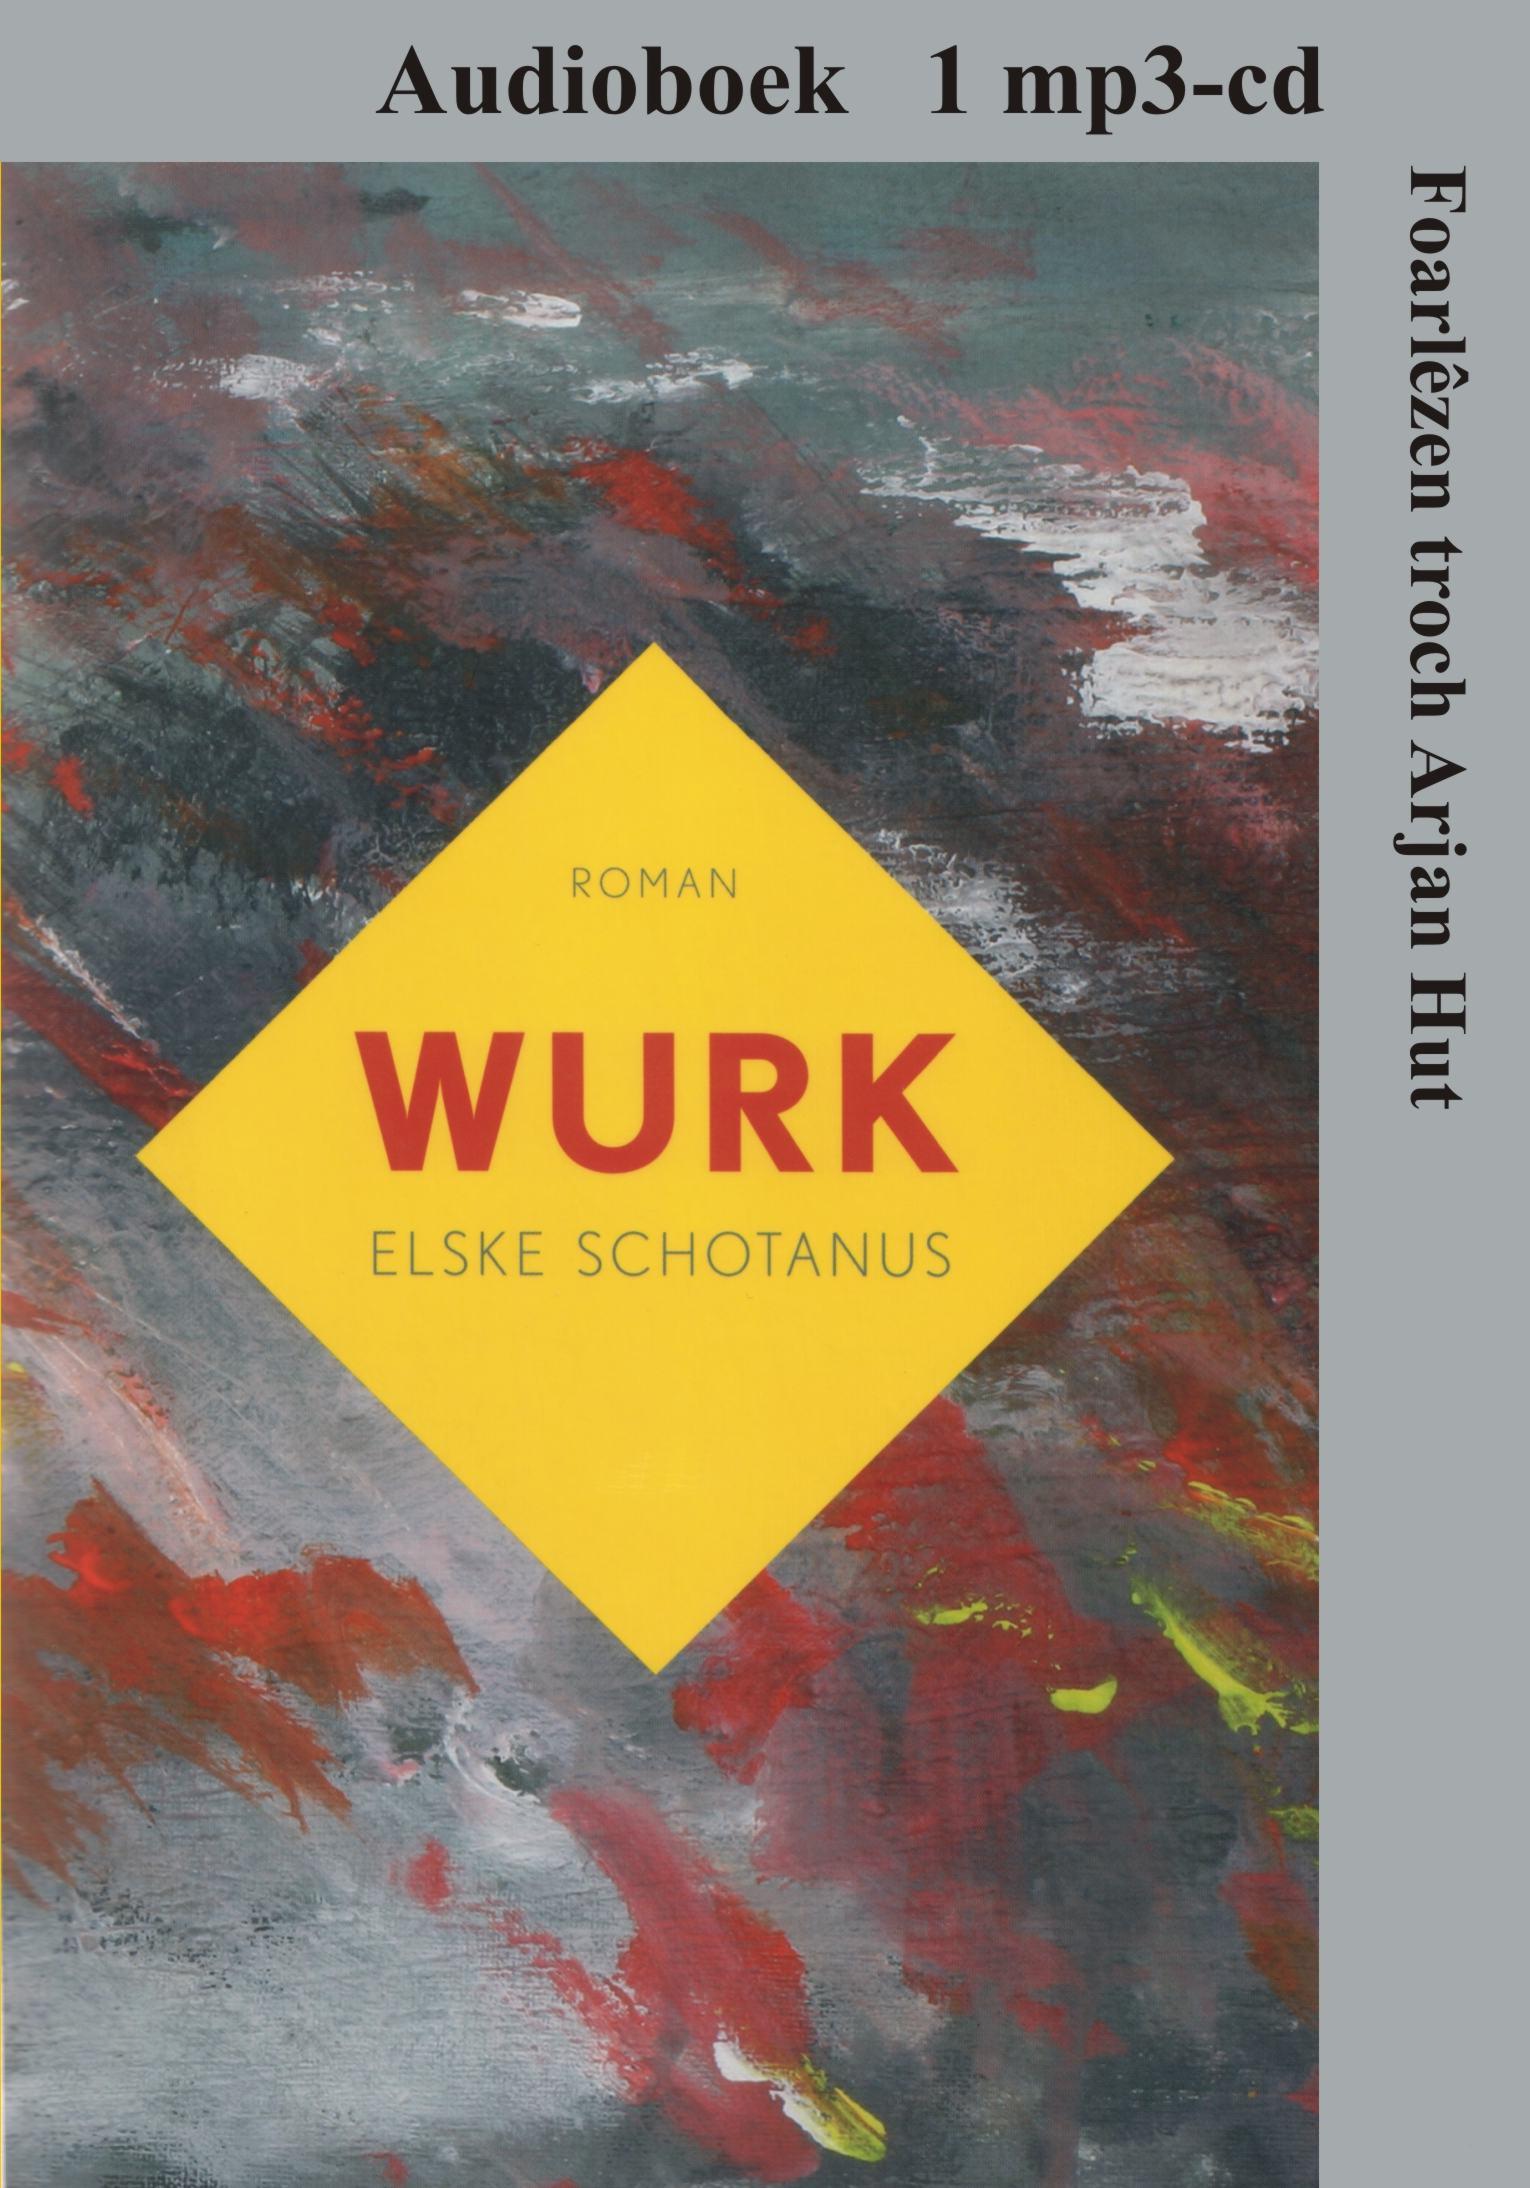 Wurk Elske Schotanus